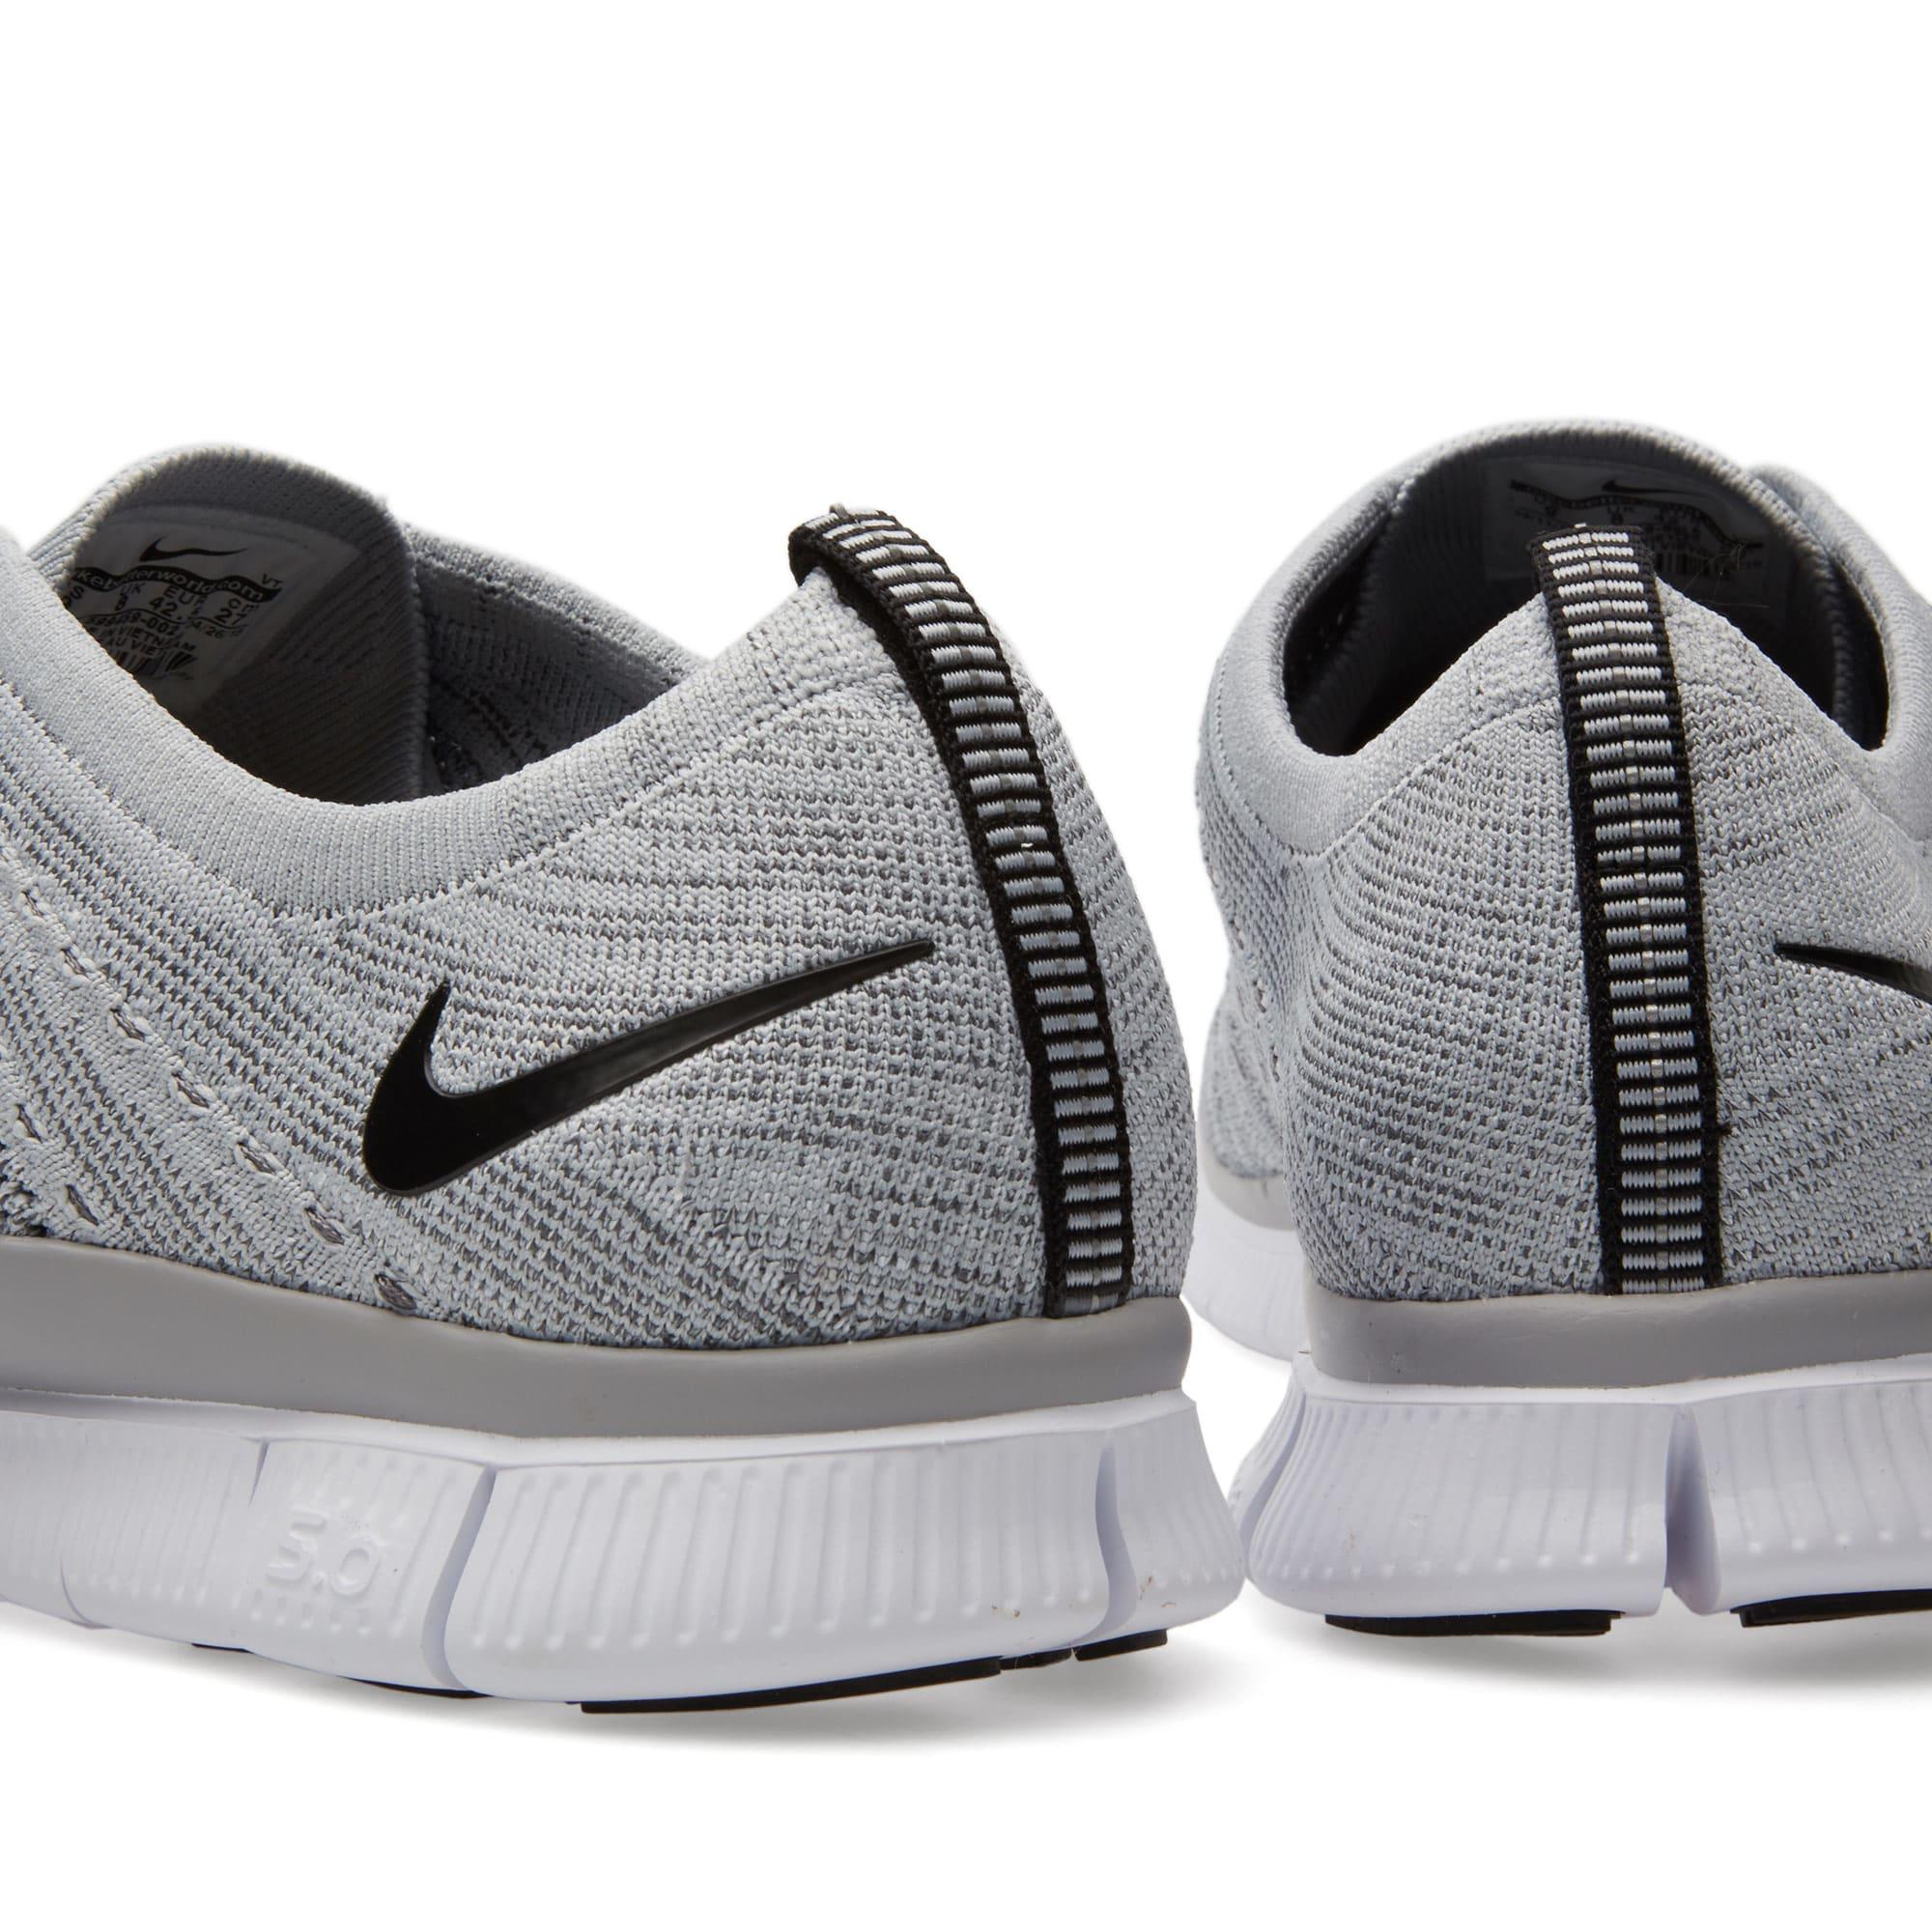 6c9084d3e4a5 Nike Free Flyknit Wolf Grey